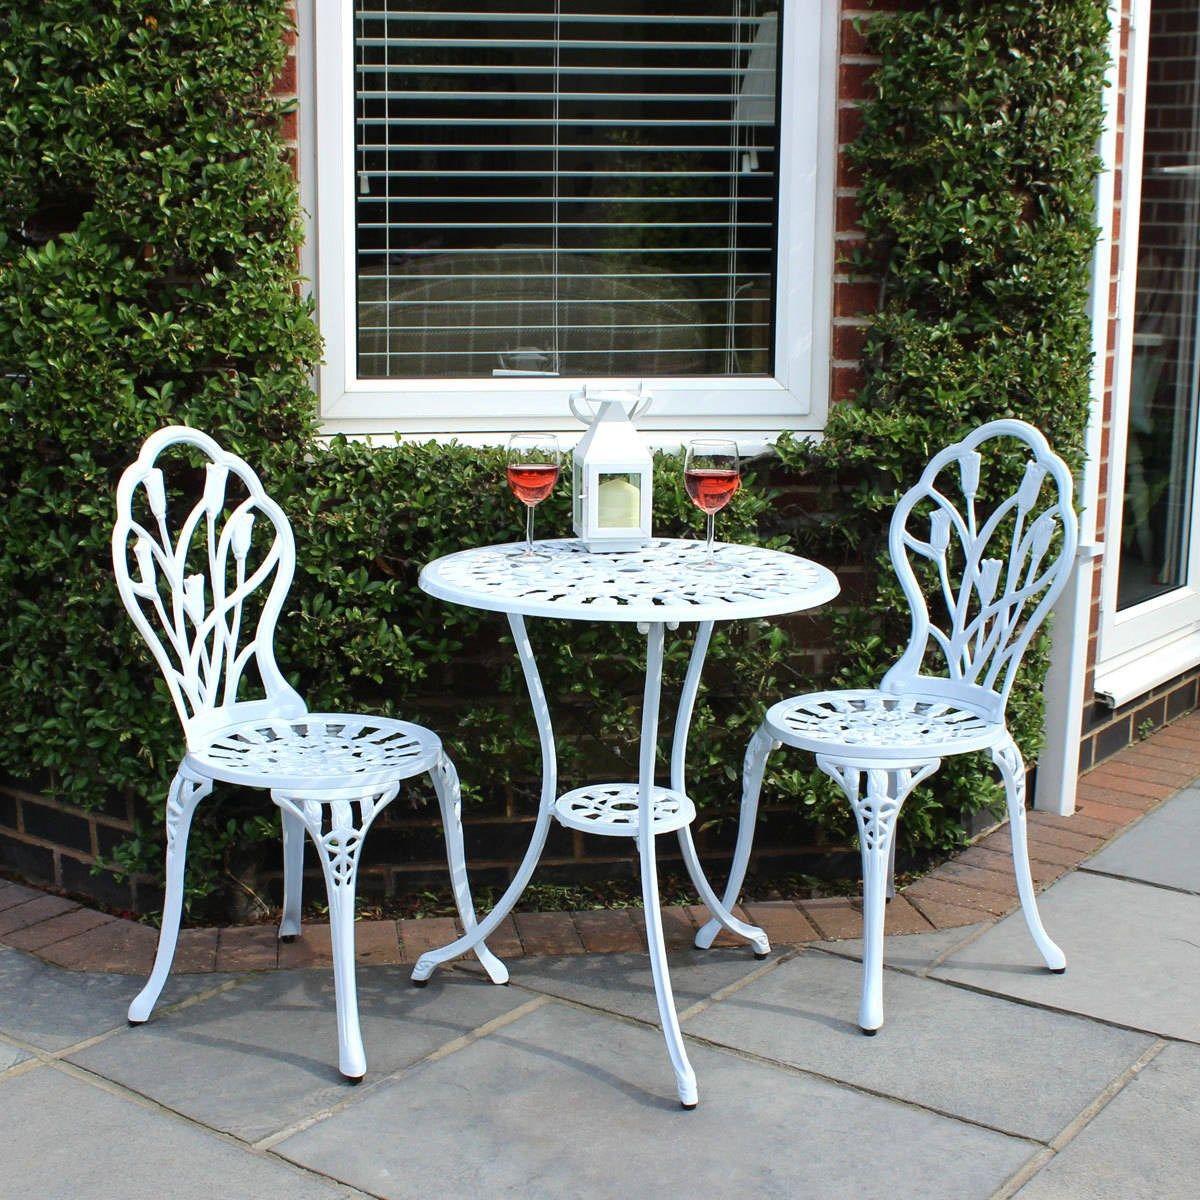 White Cast Aluminium Bistro Set Garden Furniture In 2020 Bistro